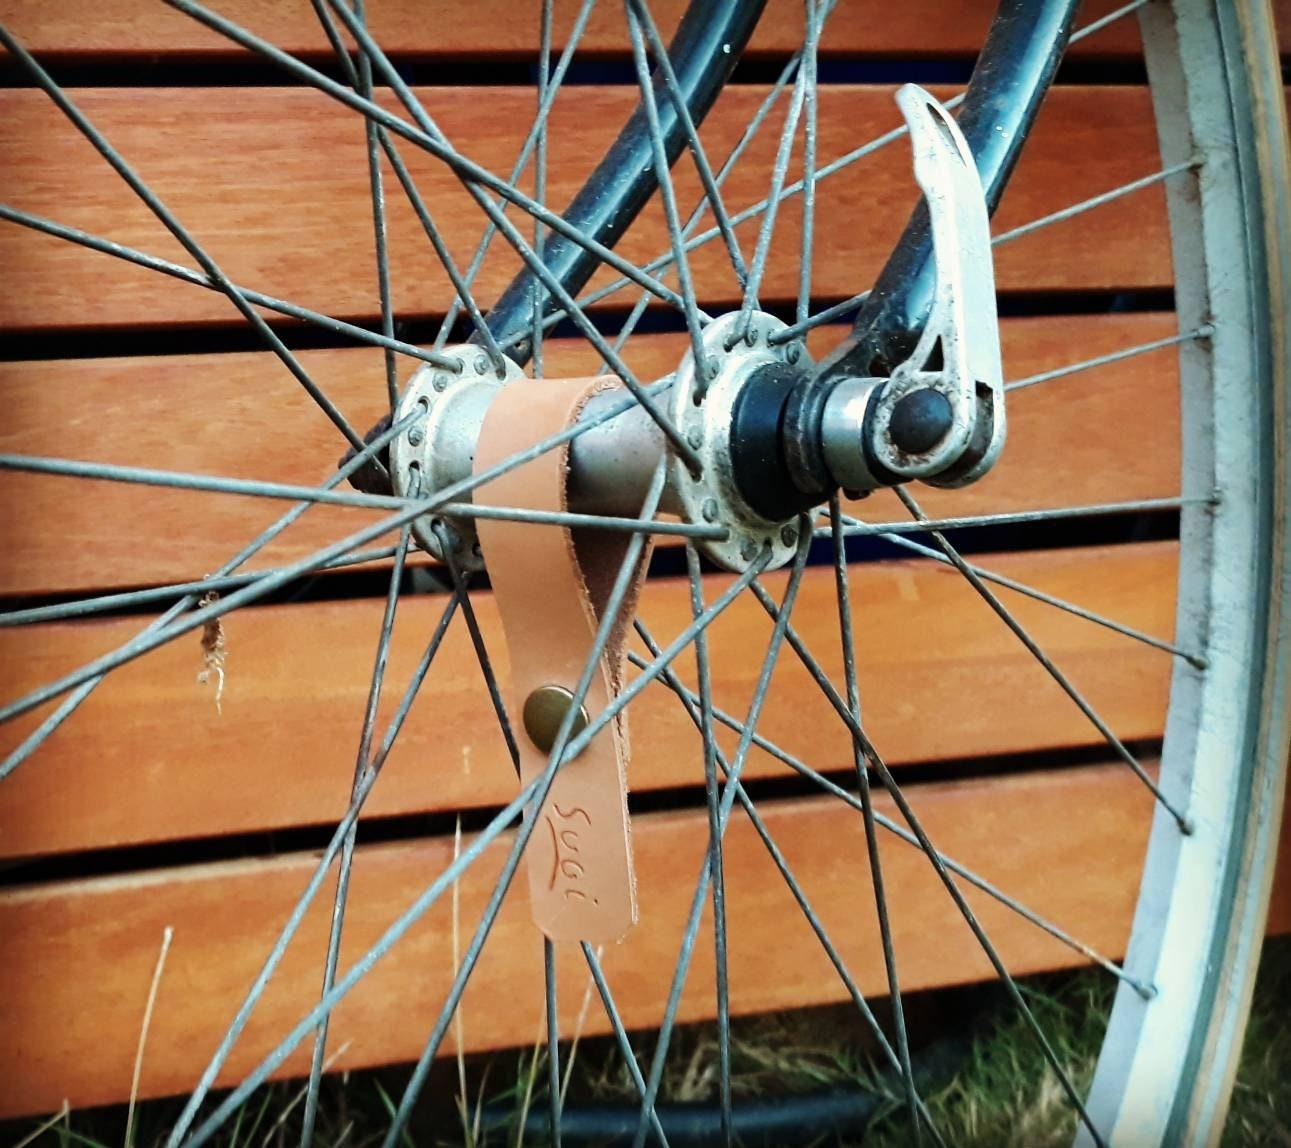 Bicycle Leather Hub Shiners Bike Horween Honey Brown Black Wheel